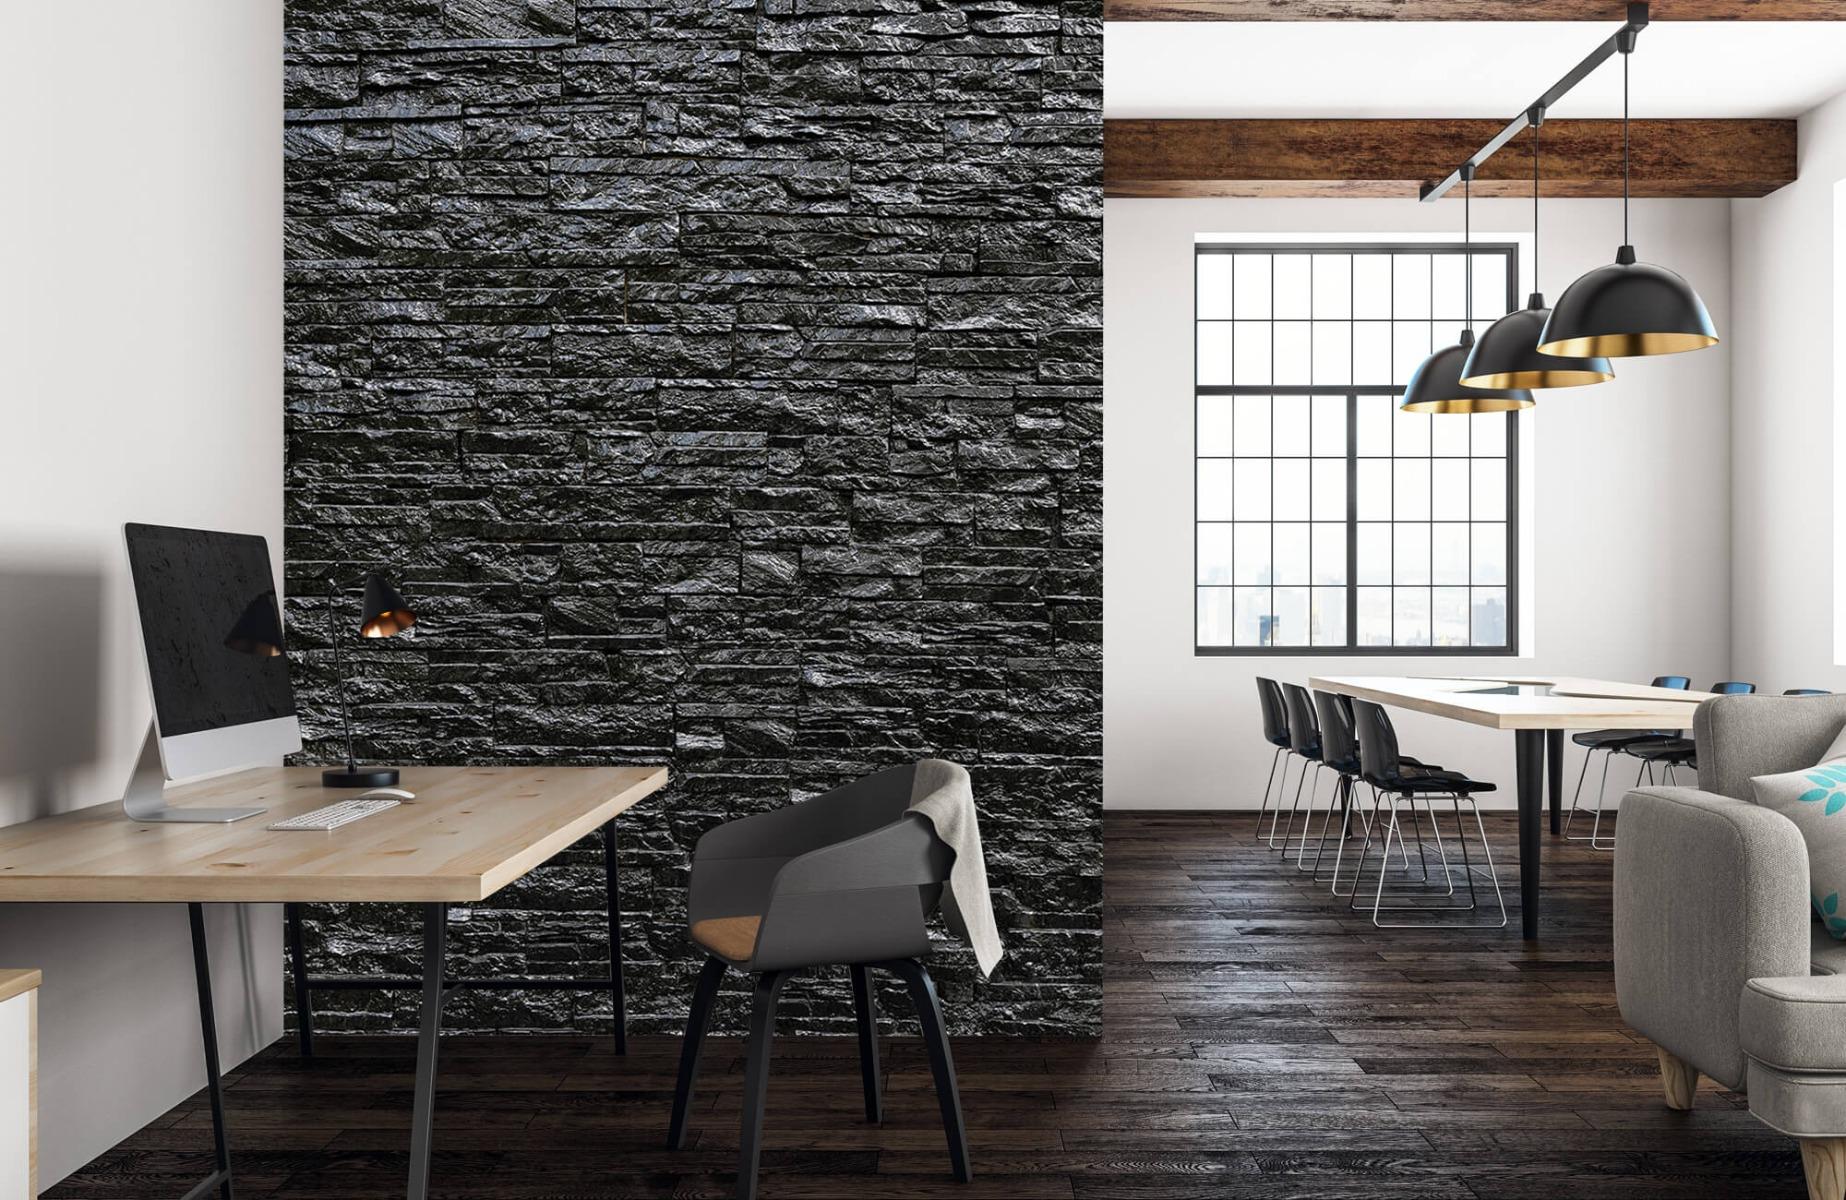 Steen behang - Zwarte stenen - Slaapkamer 22